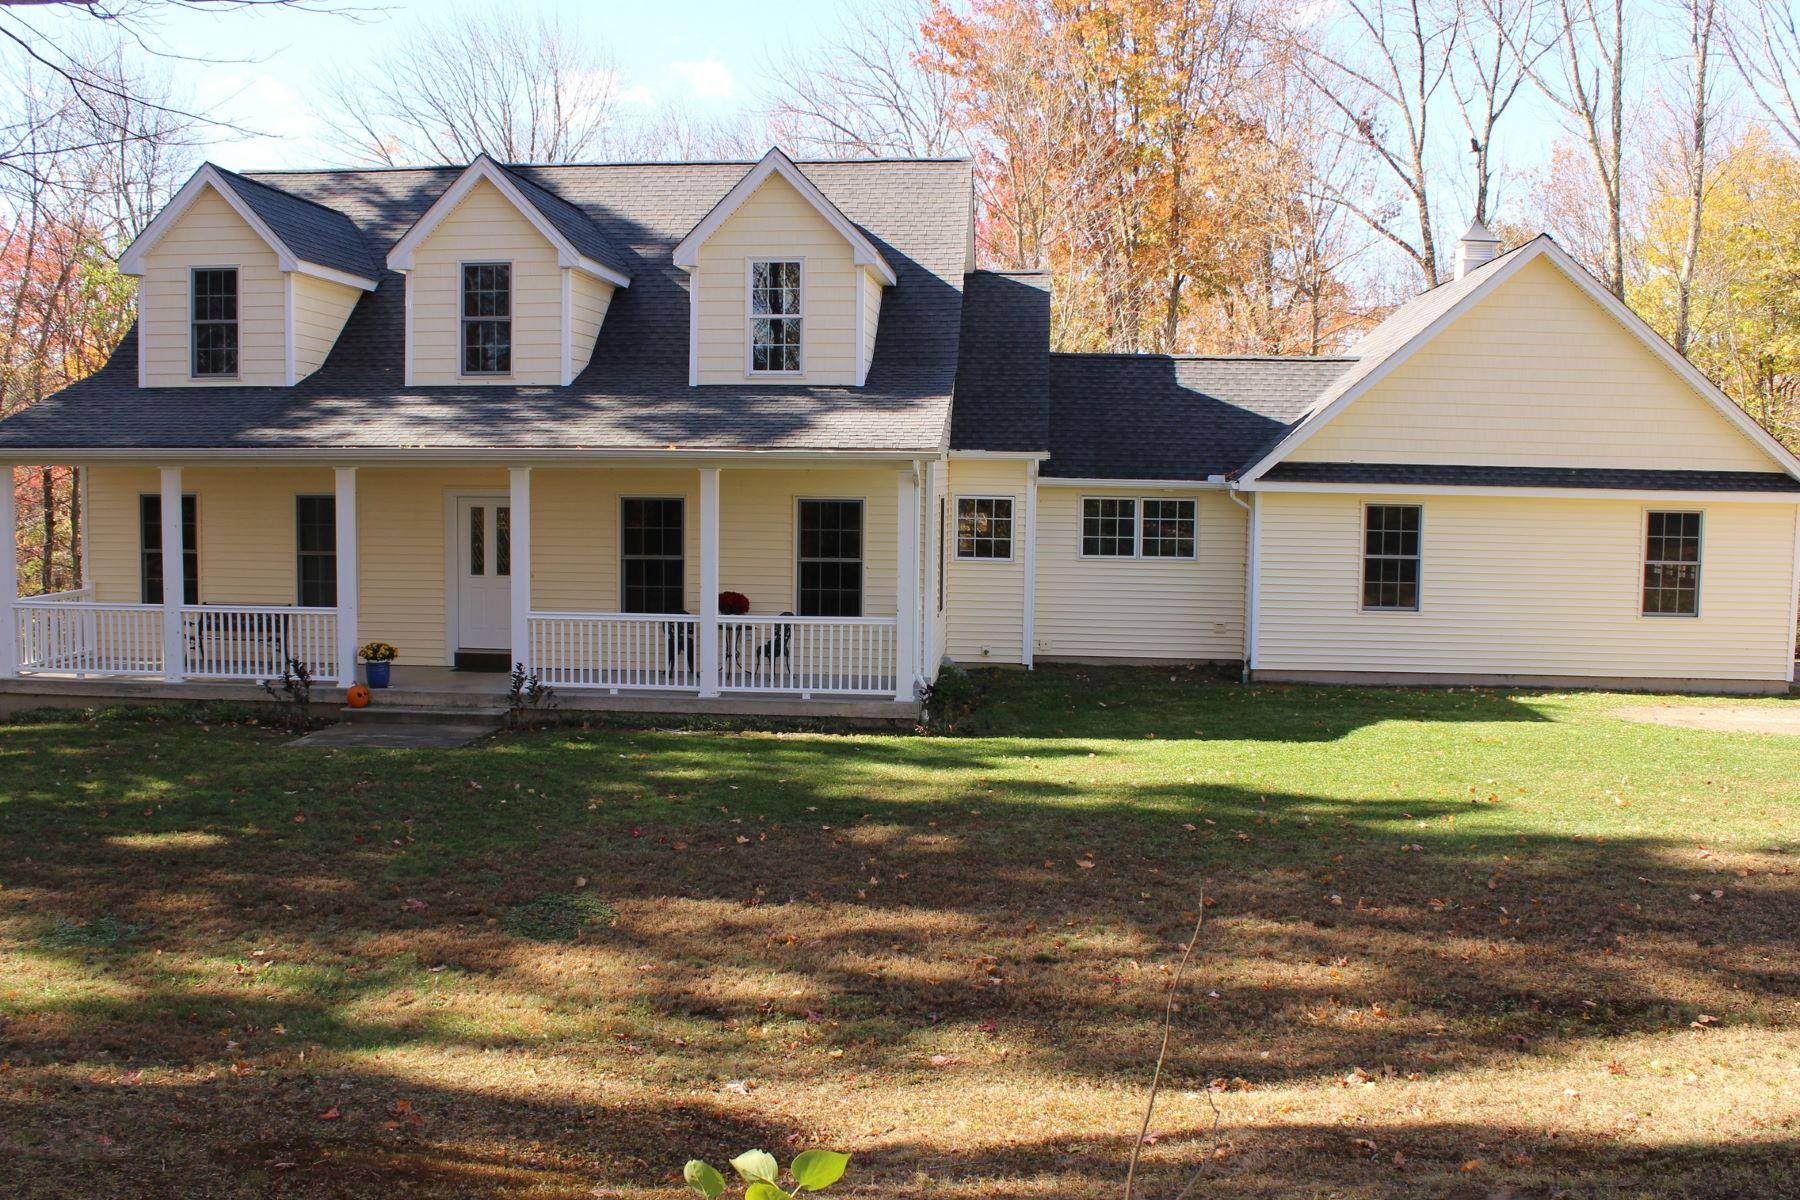 Casa Unifamiliar por un Venta en Custom Built Cape 160 East Chestnut Hill Rd Litchfield, Connecticut, 06759 Estados Unidos